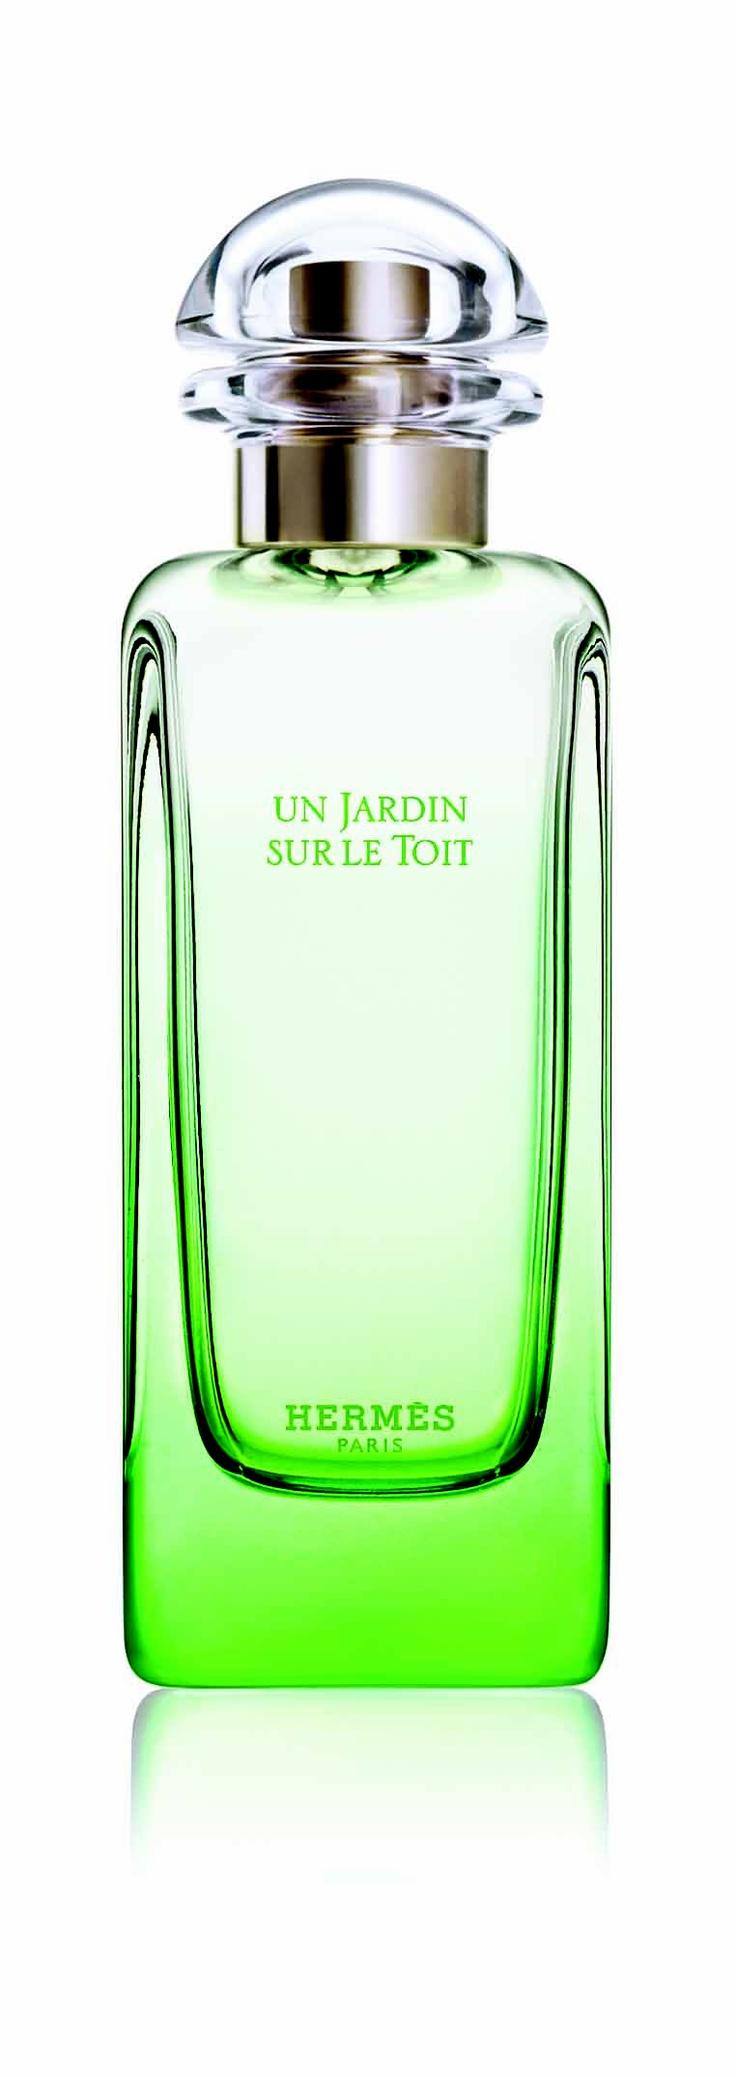 17 best images about flavors on pinterest perfume for - Hermes un jardin en mediterranee body lotion ...